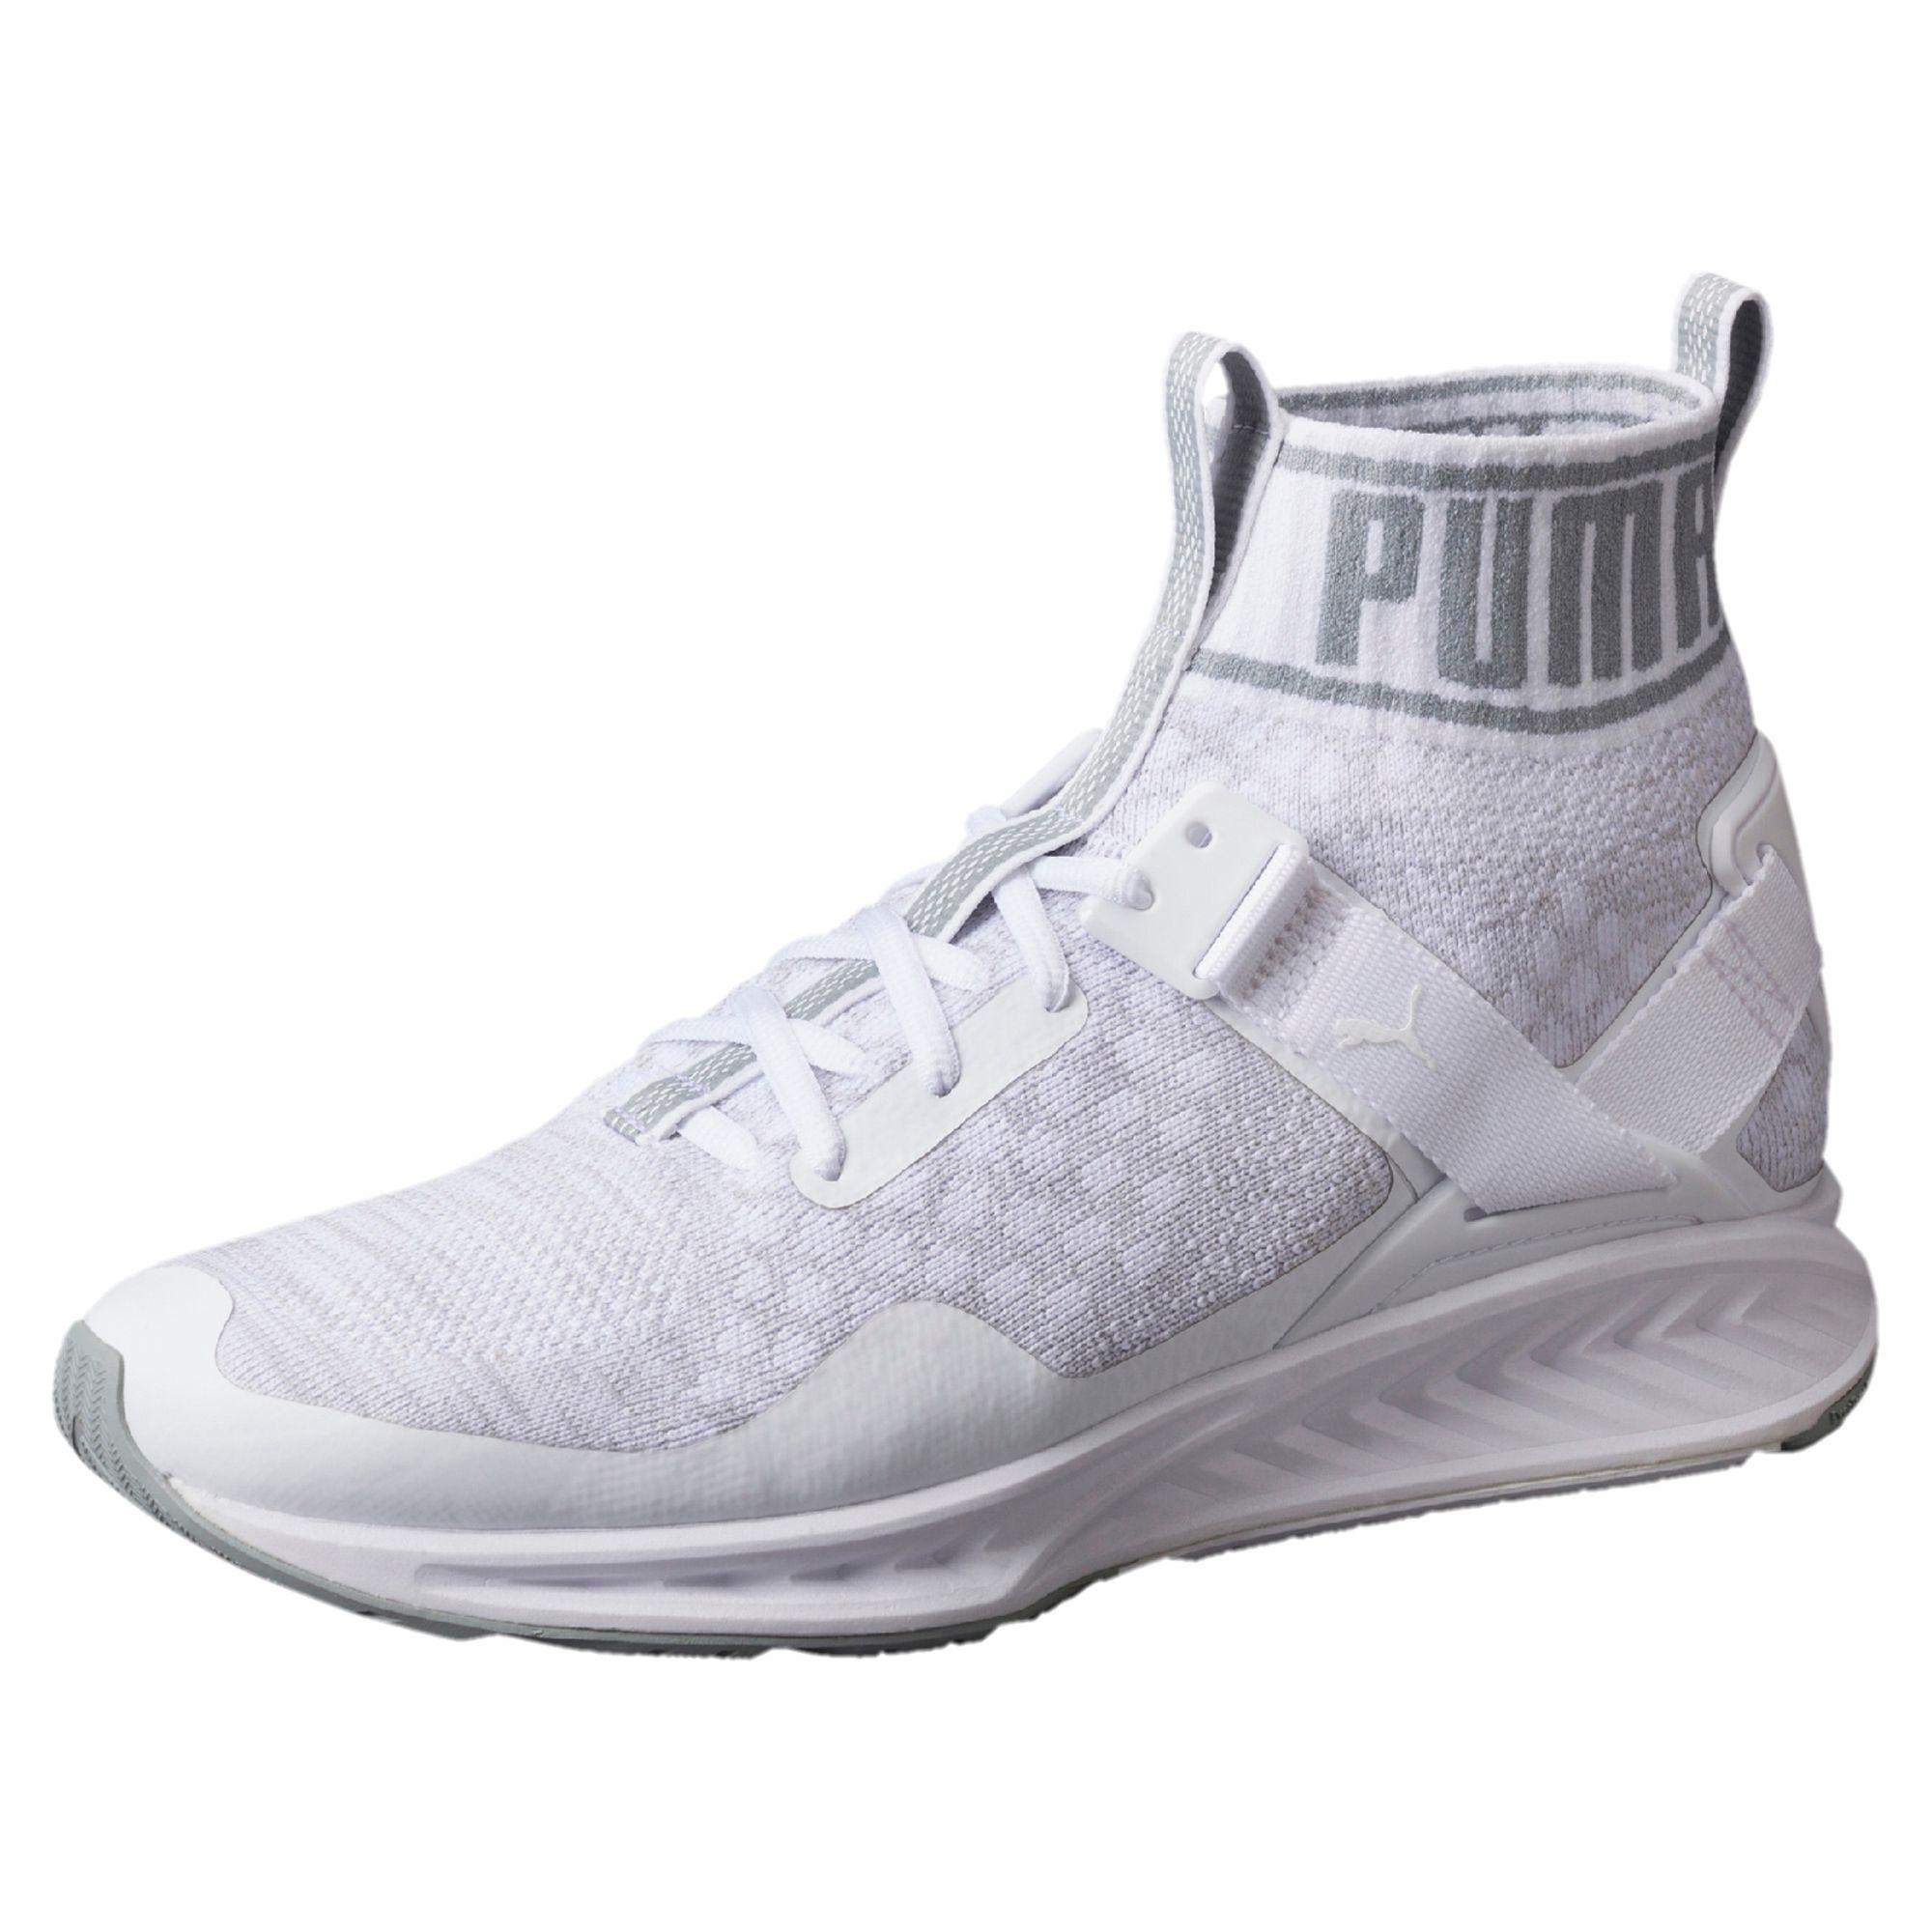 IGNITE evoKNIT мужские кроссовки